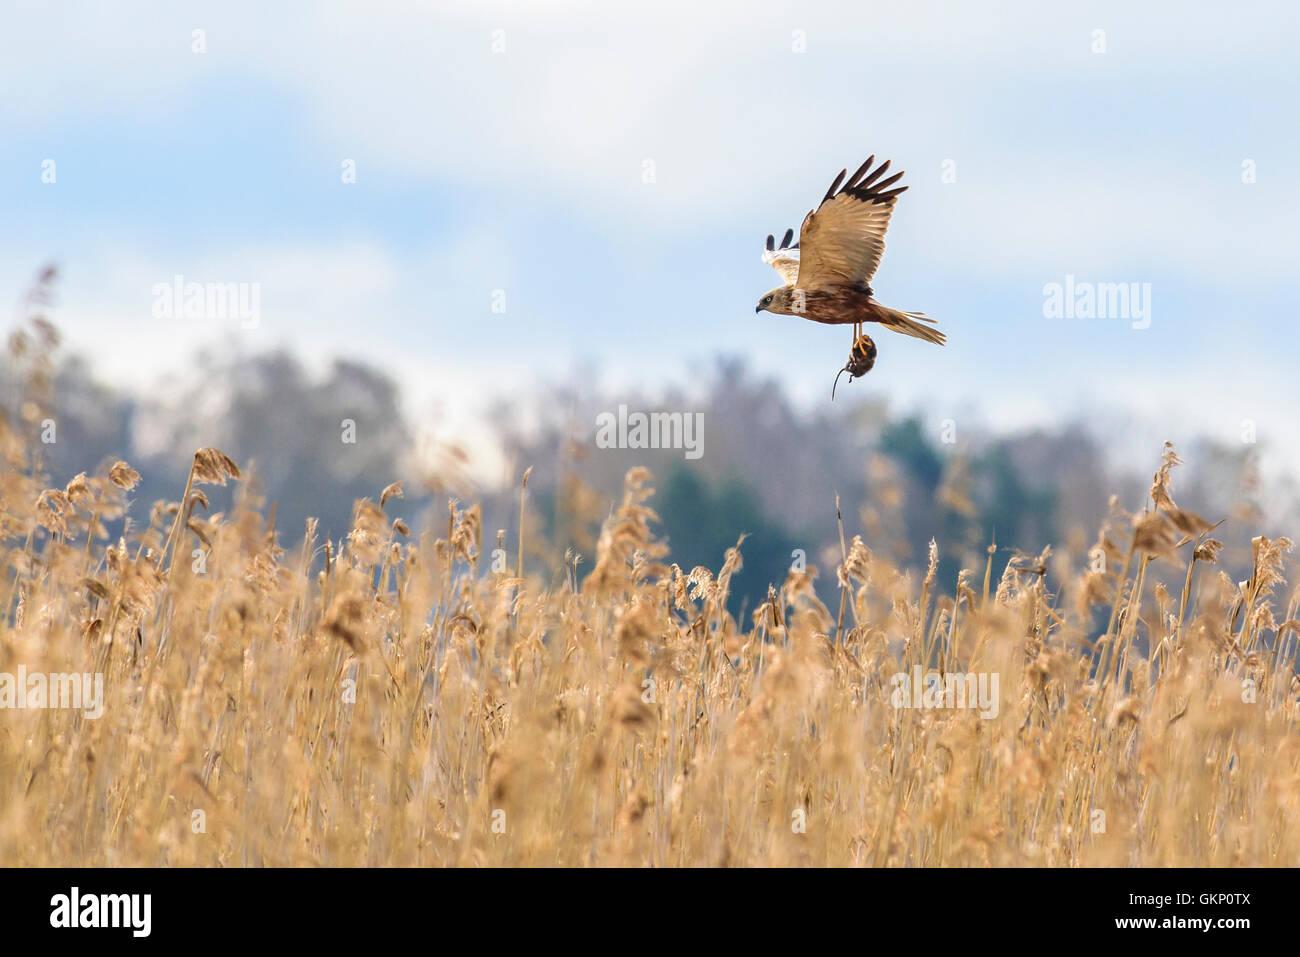 rovfågel, brun kärrhök, fågel, jagar, vass, sjö, sork, råtta ...